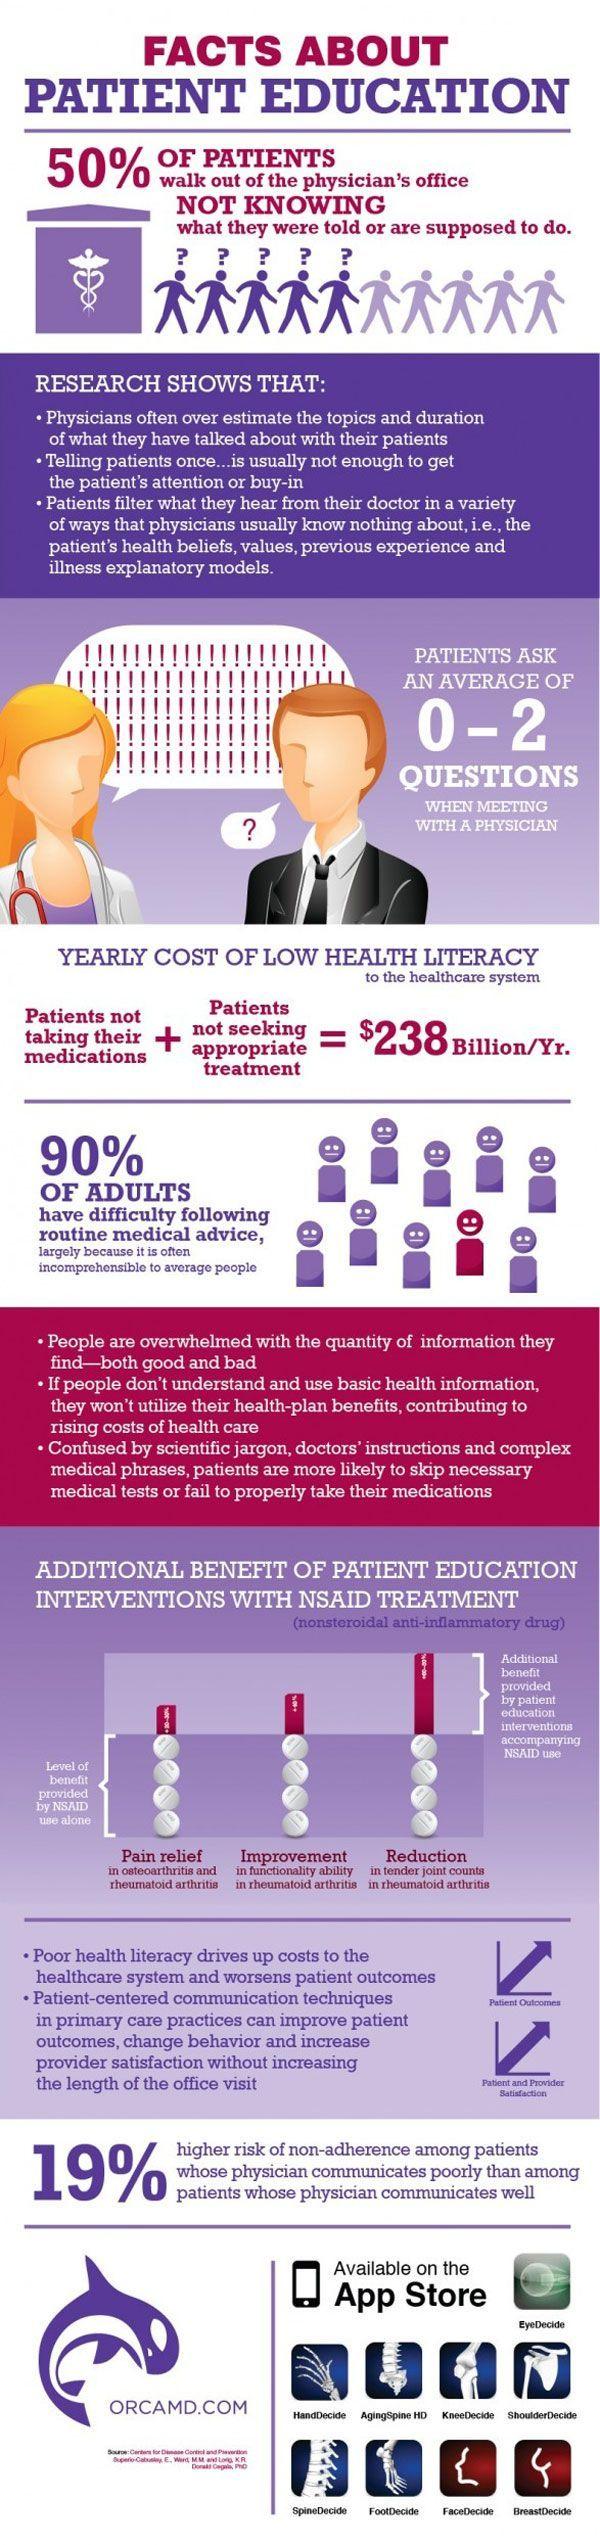 facts about patient education